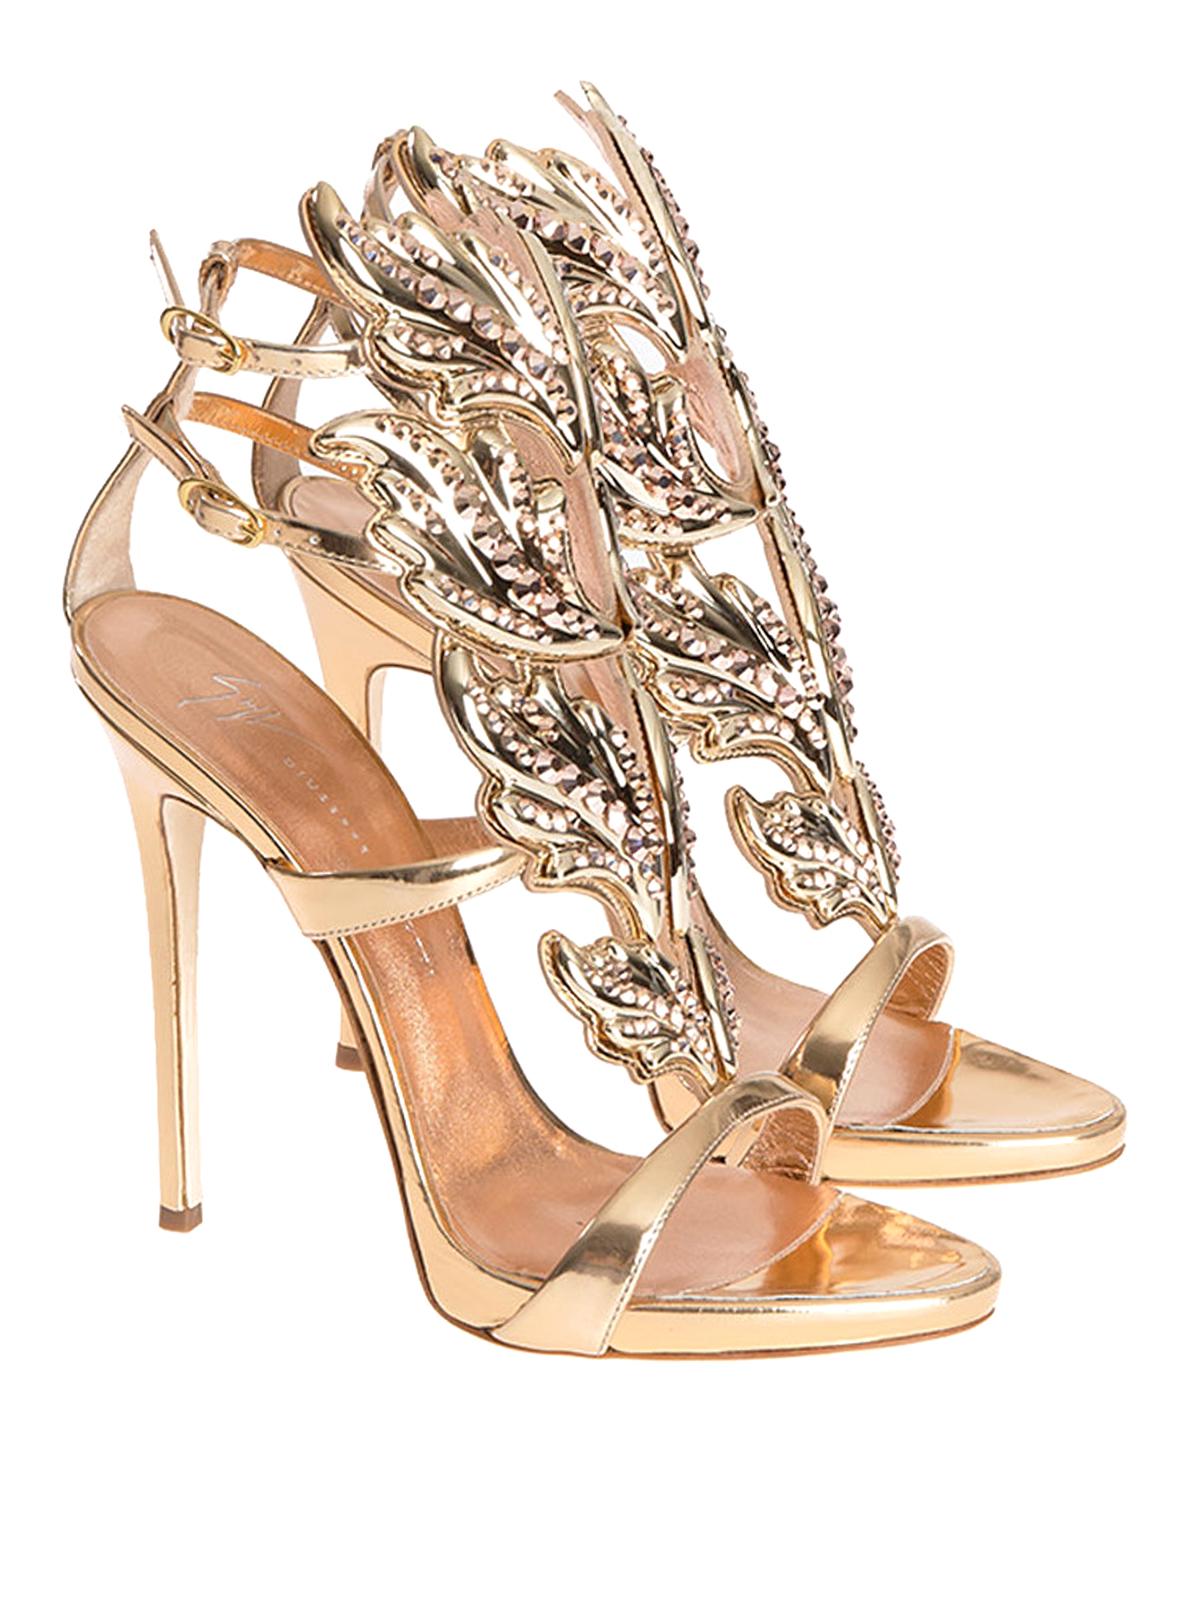 GIUSEPPE ZANOTTI Embellished Open Toe Sandal t0ExVyZ3v